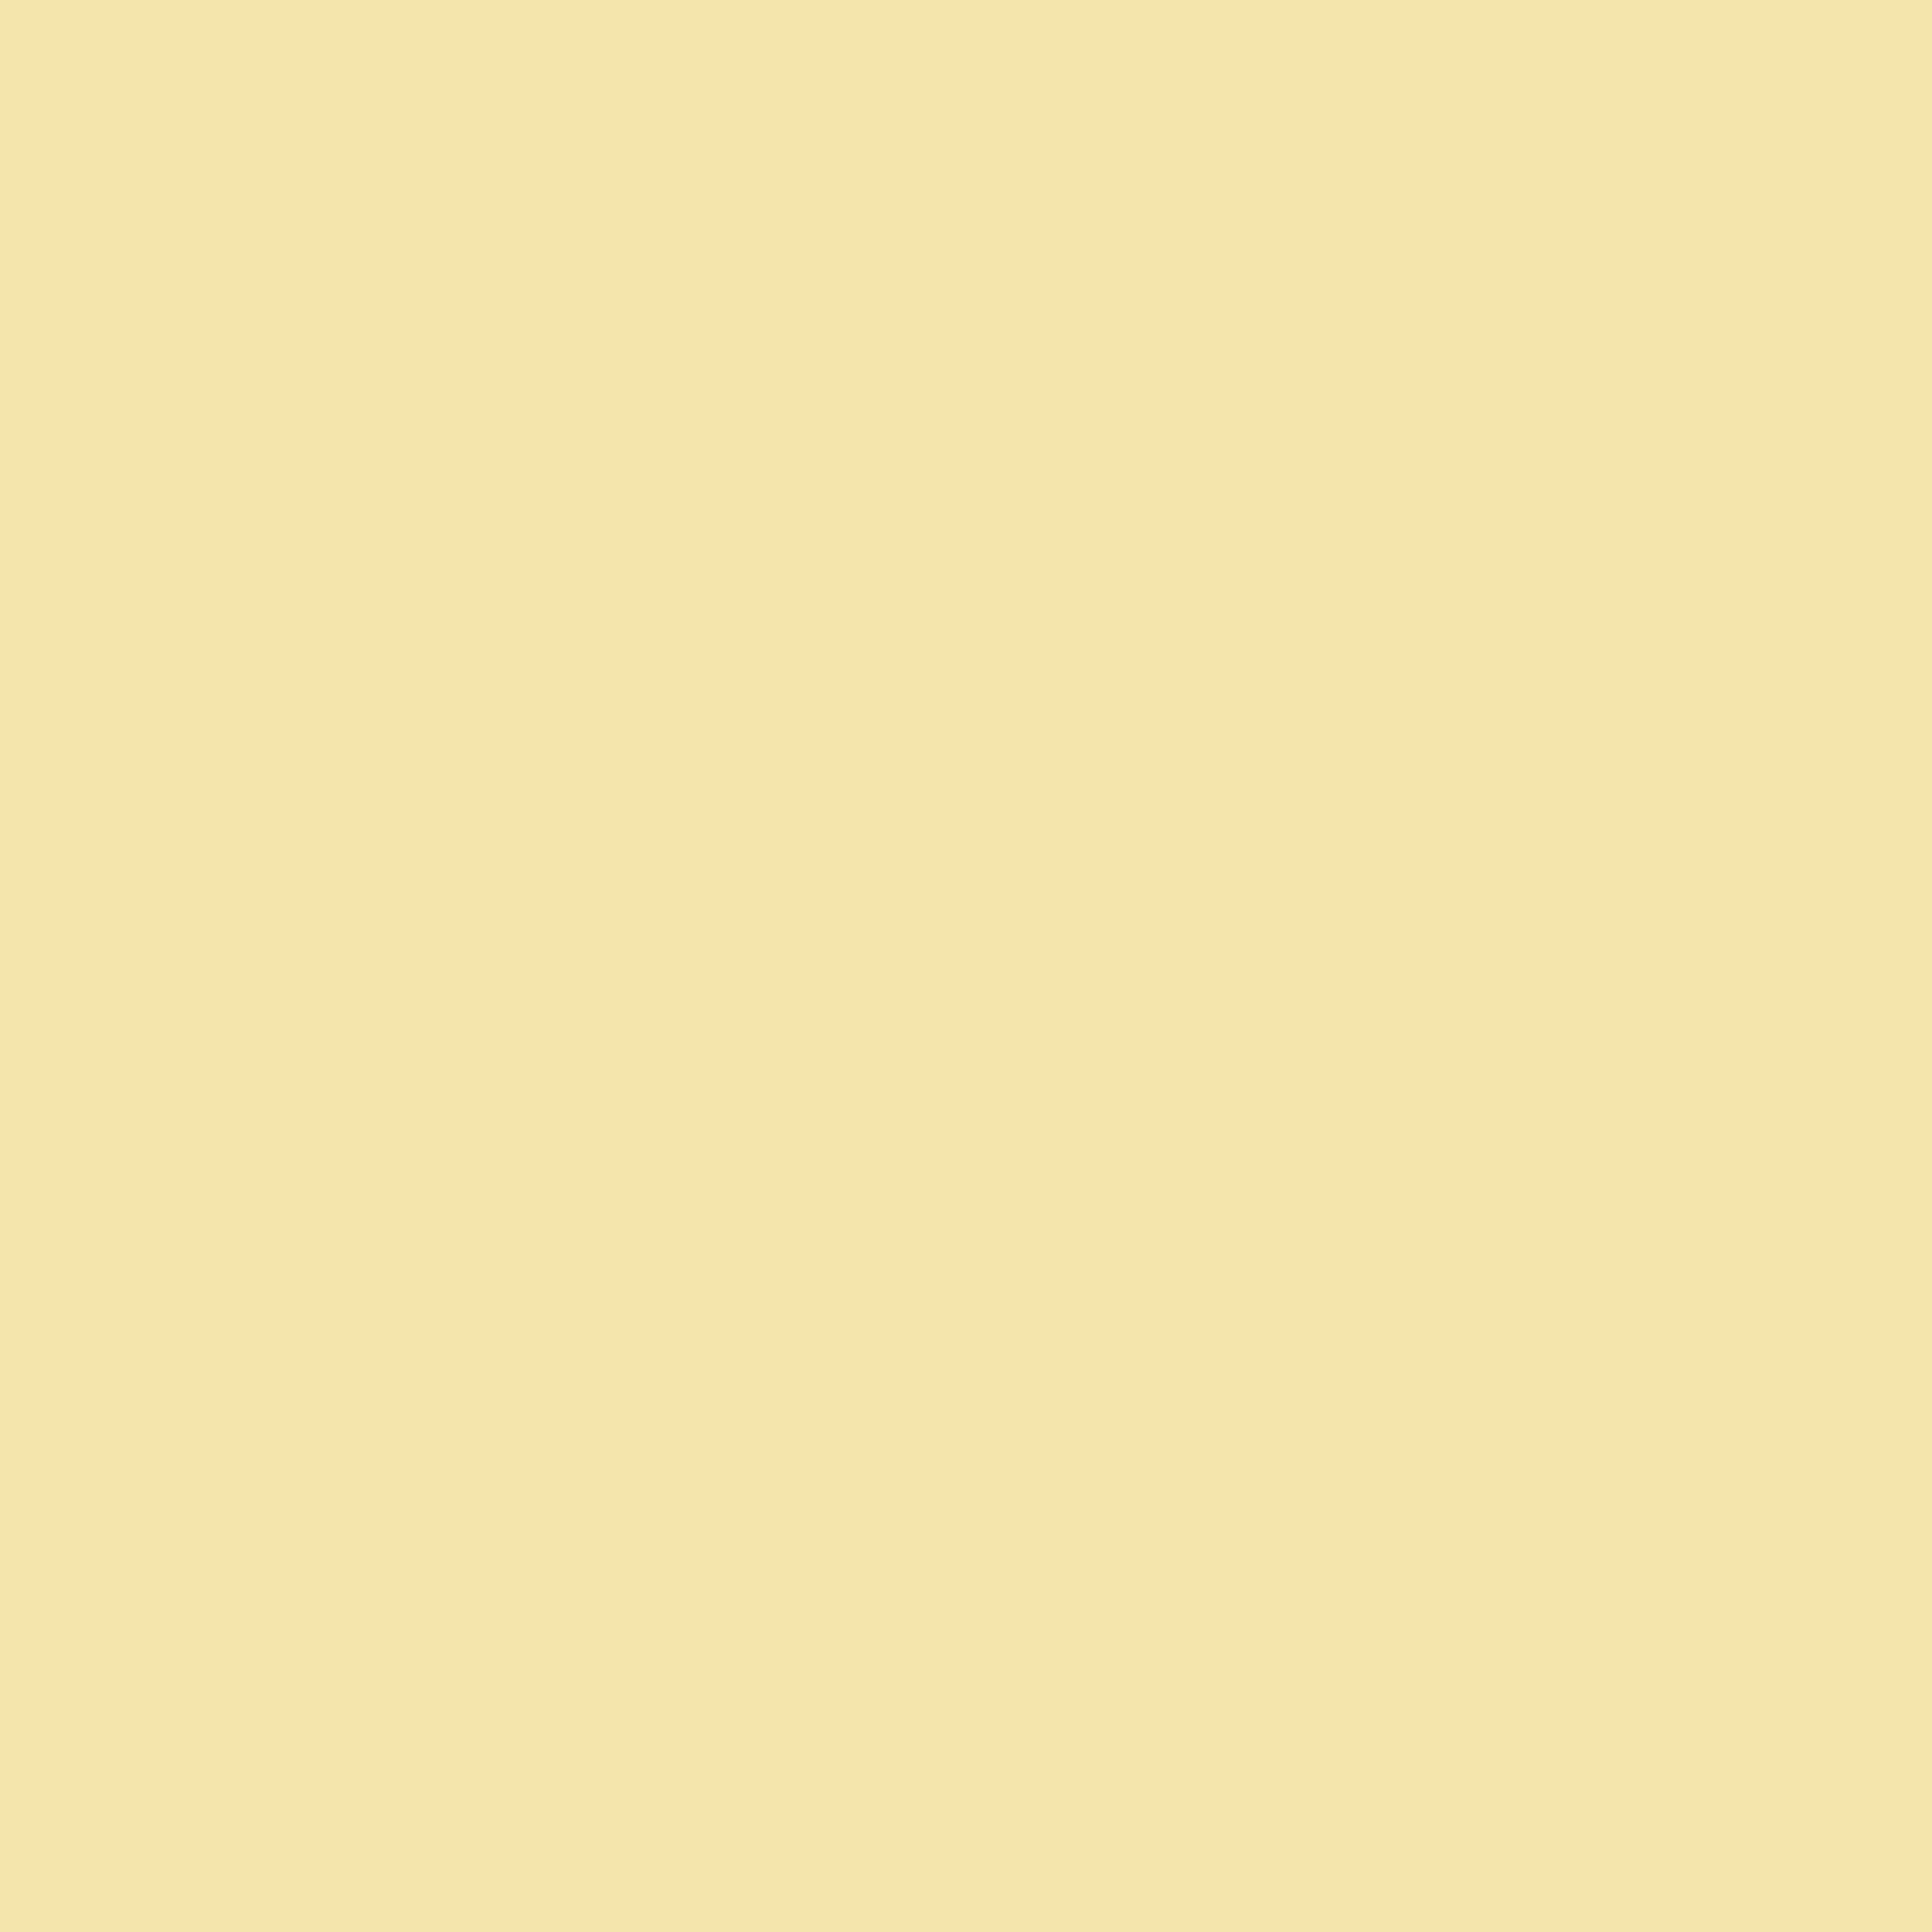 3600x3600 Vanilla Solid Color Background